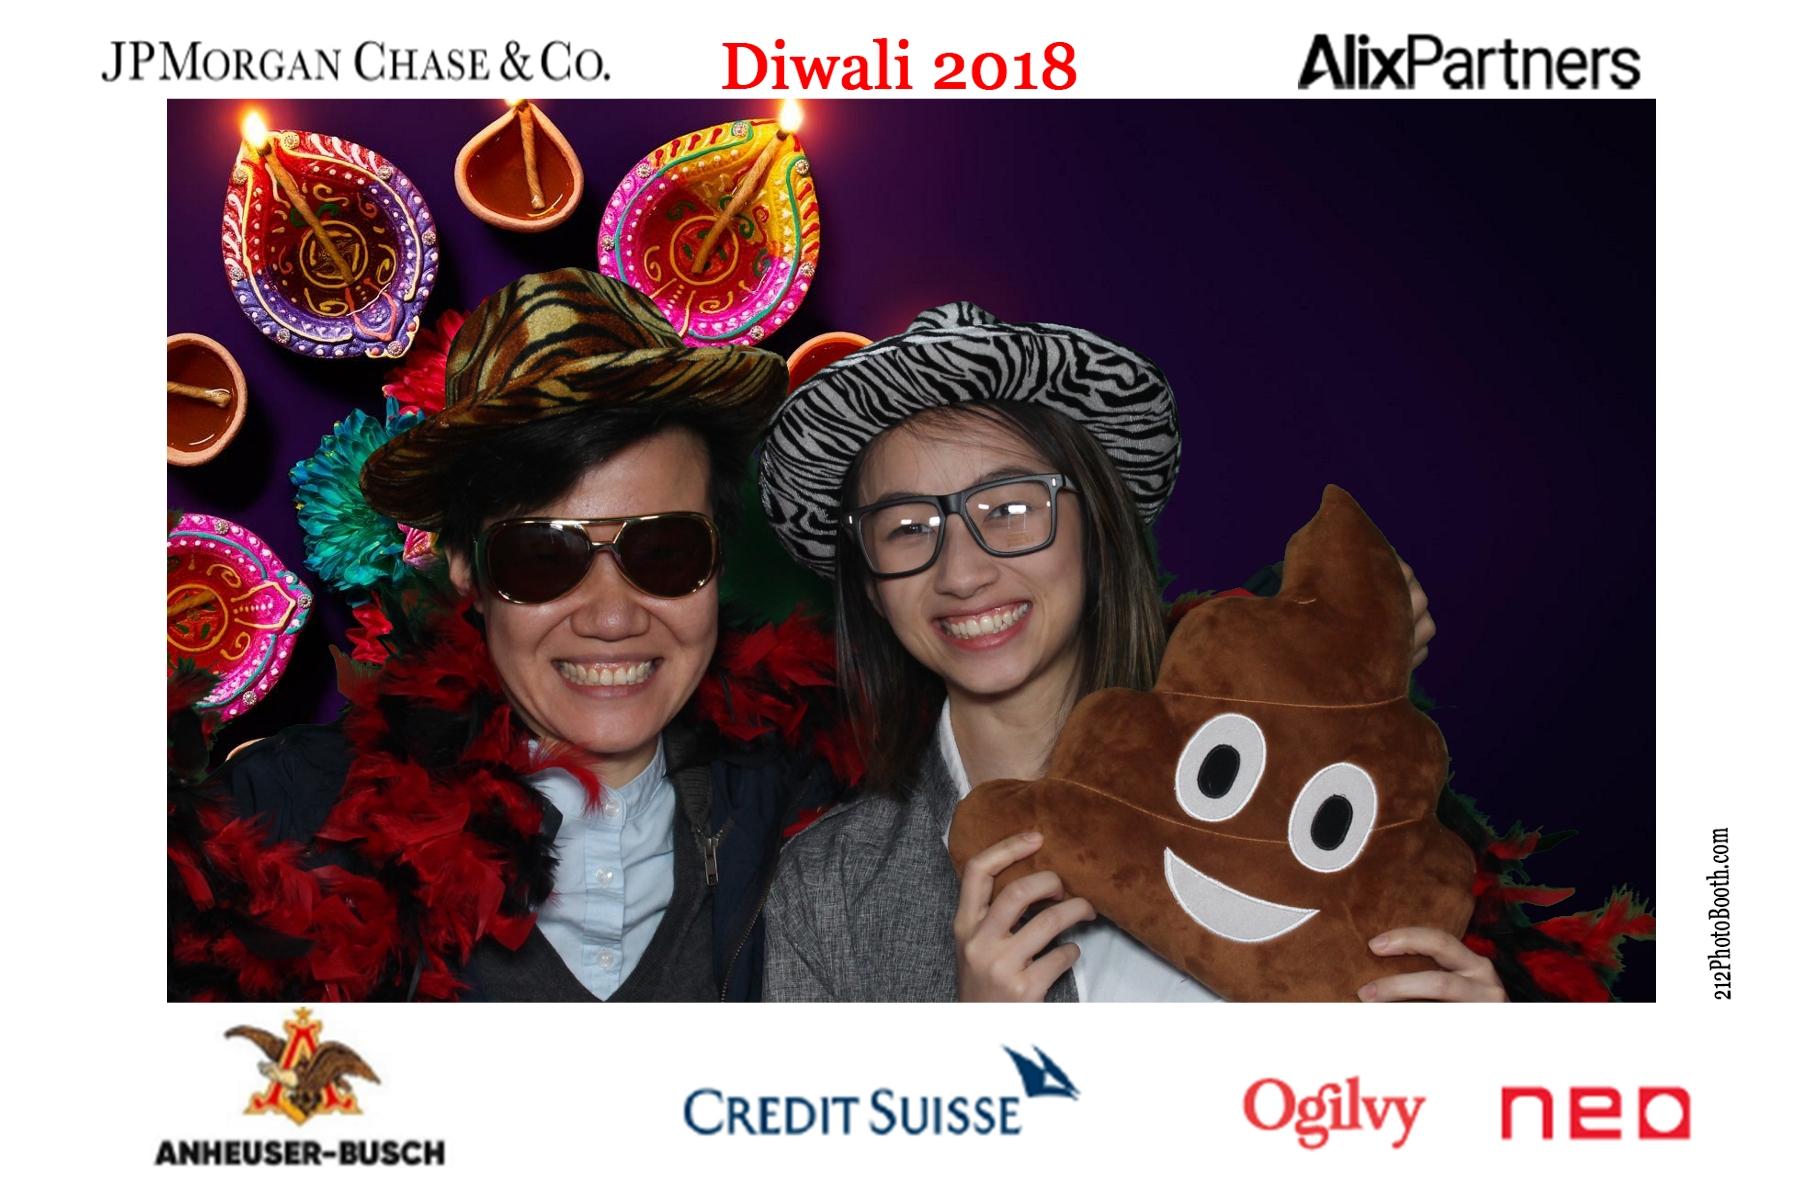 diwali 2018 photo